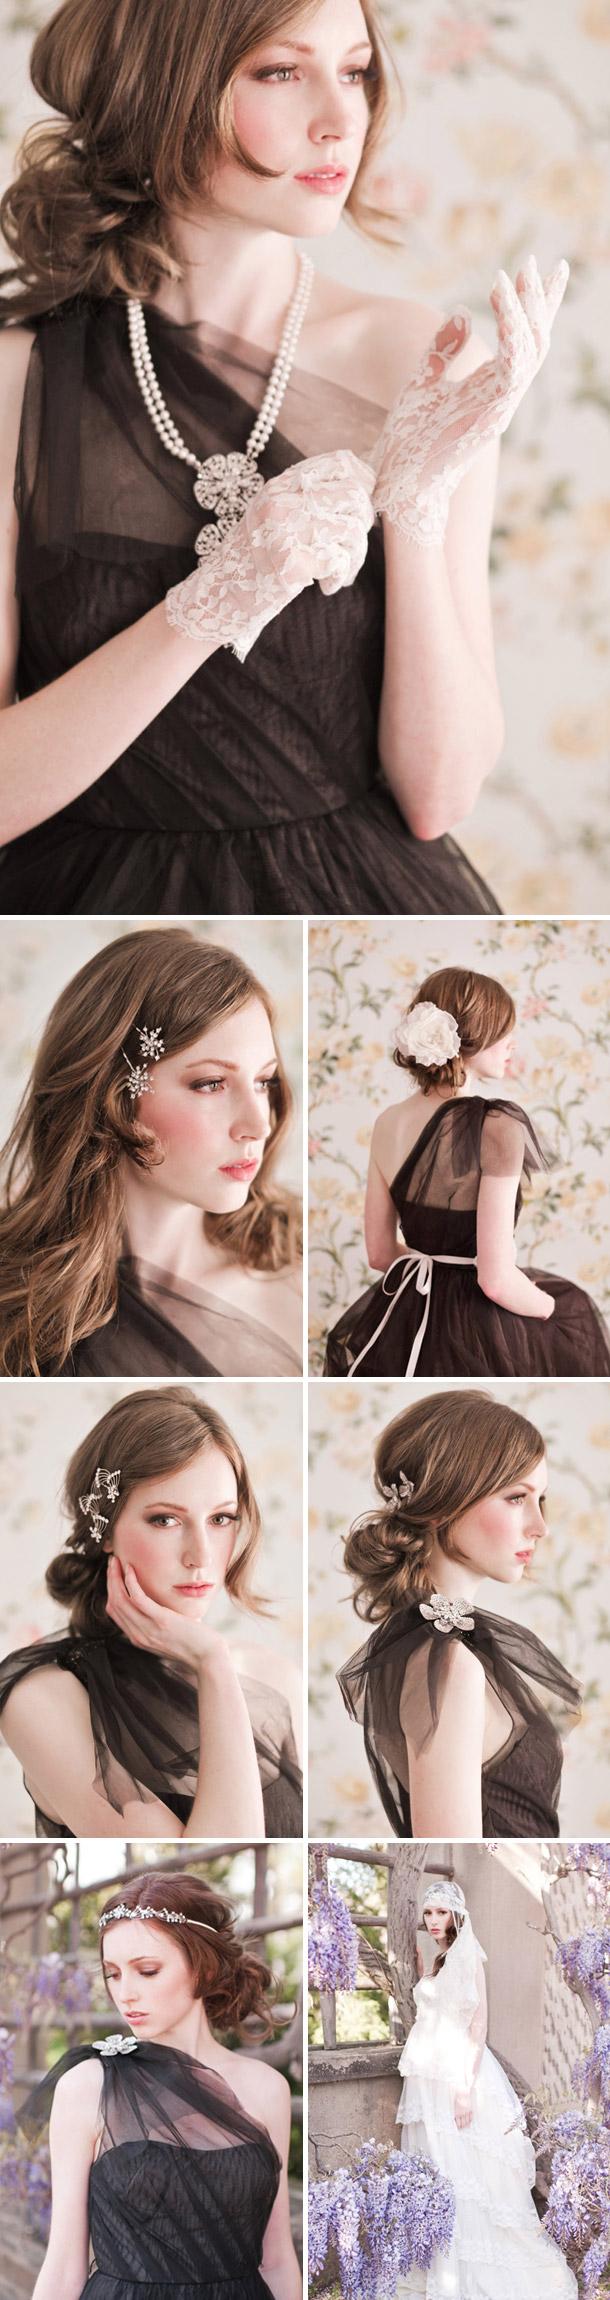 Zauberhafte Accessoires von Enchantes Atelier